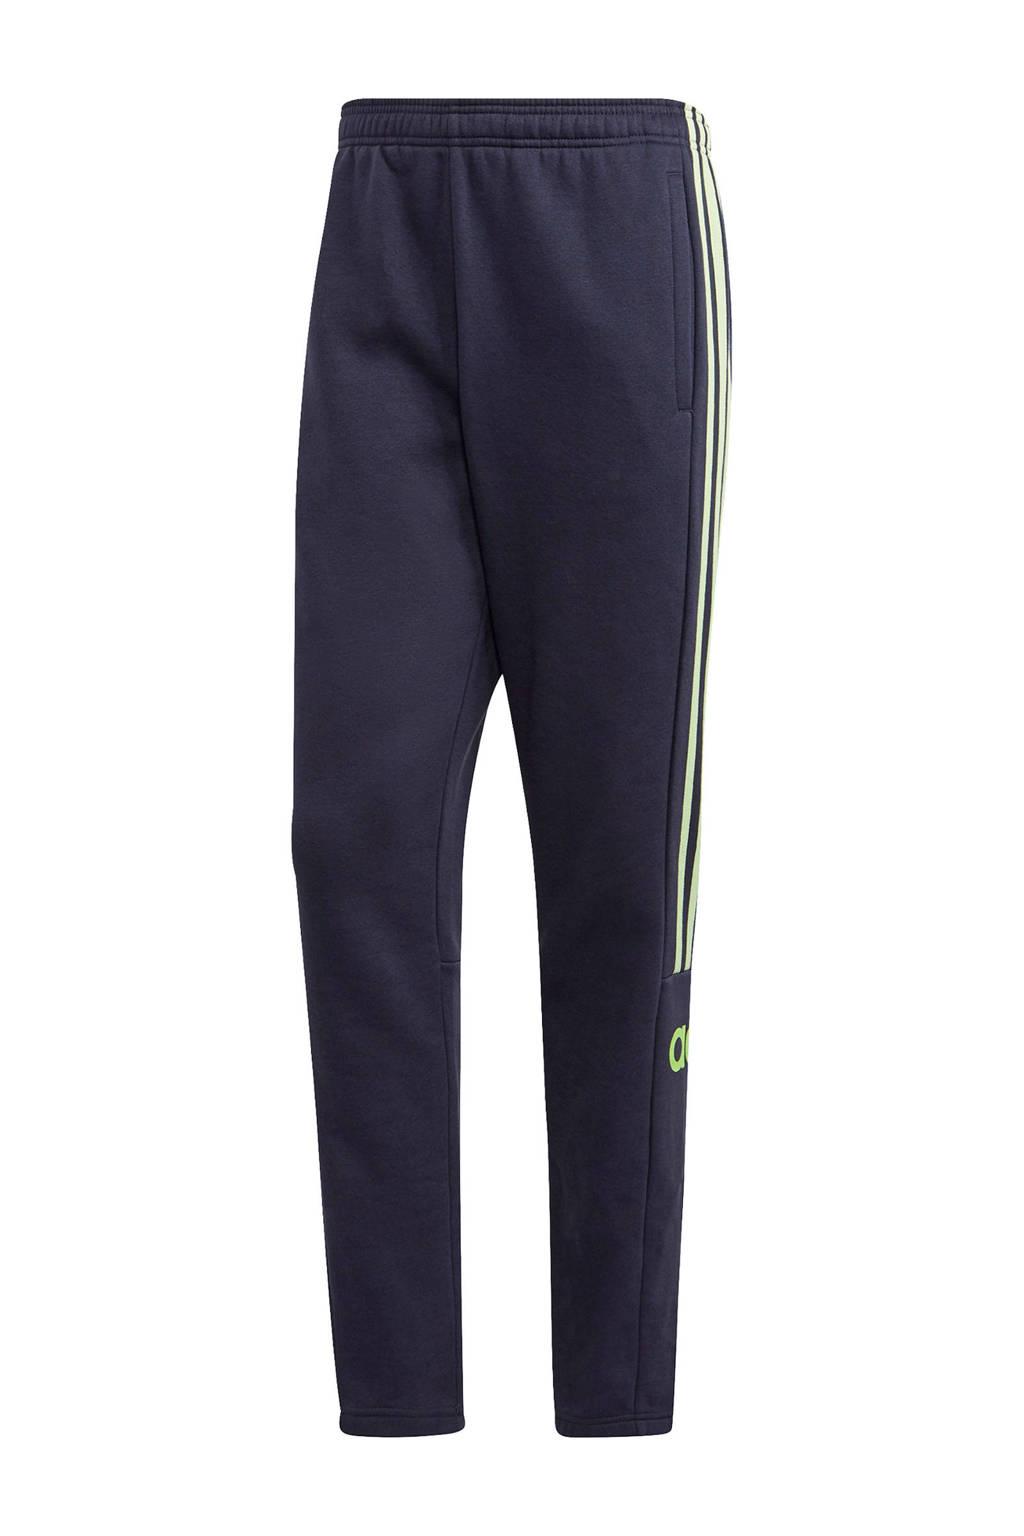 adidas Performance   joggingbroek donkerblauw/limegroen, Zwart/limegroen